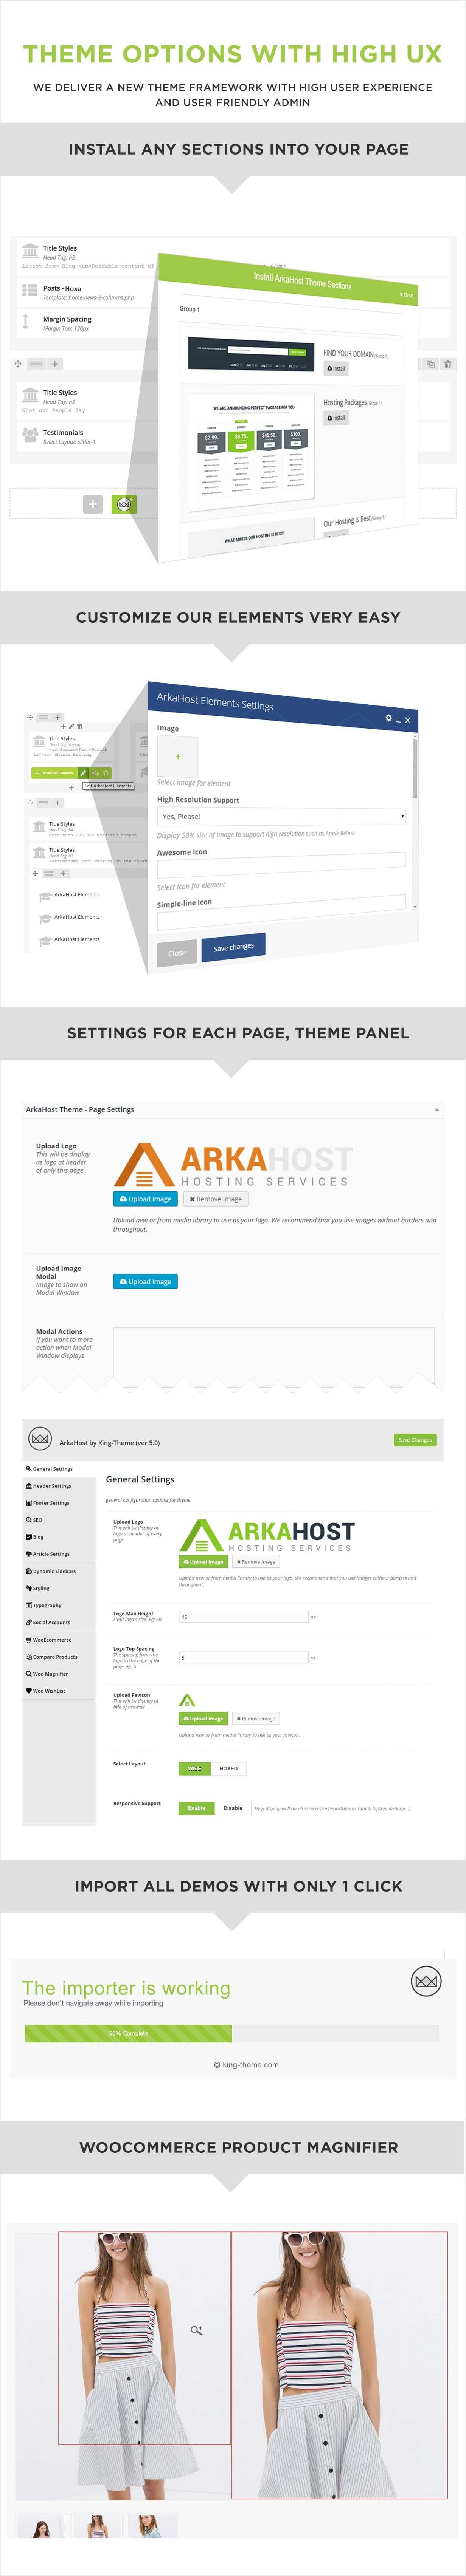 des5 - ArkaHost - WHMCS WordPress Theme